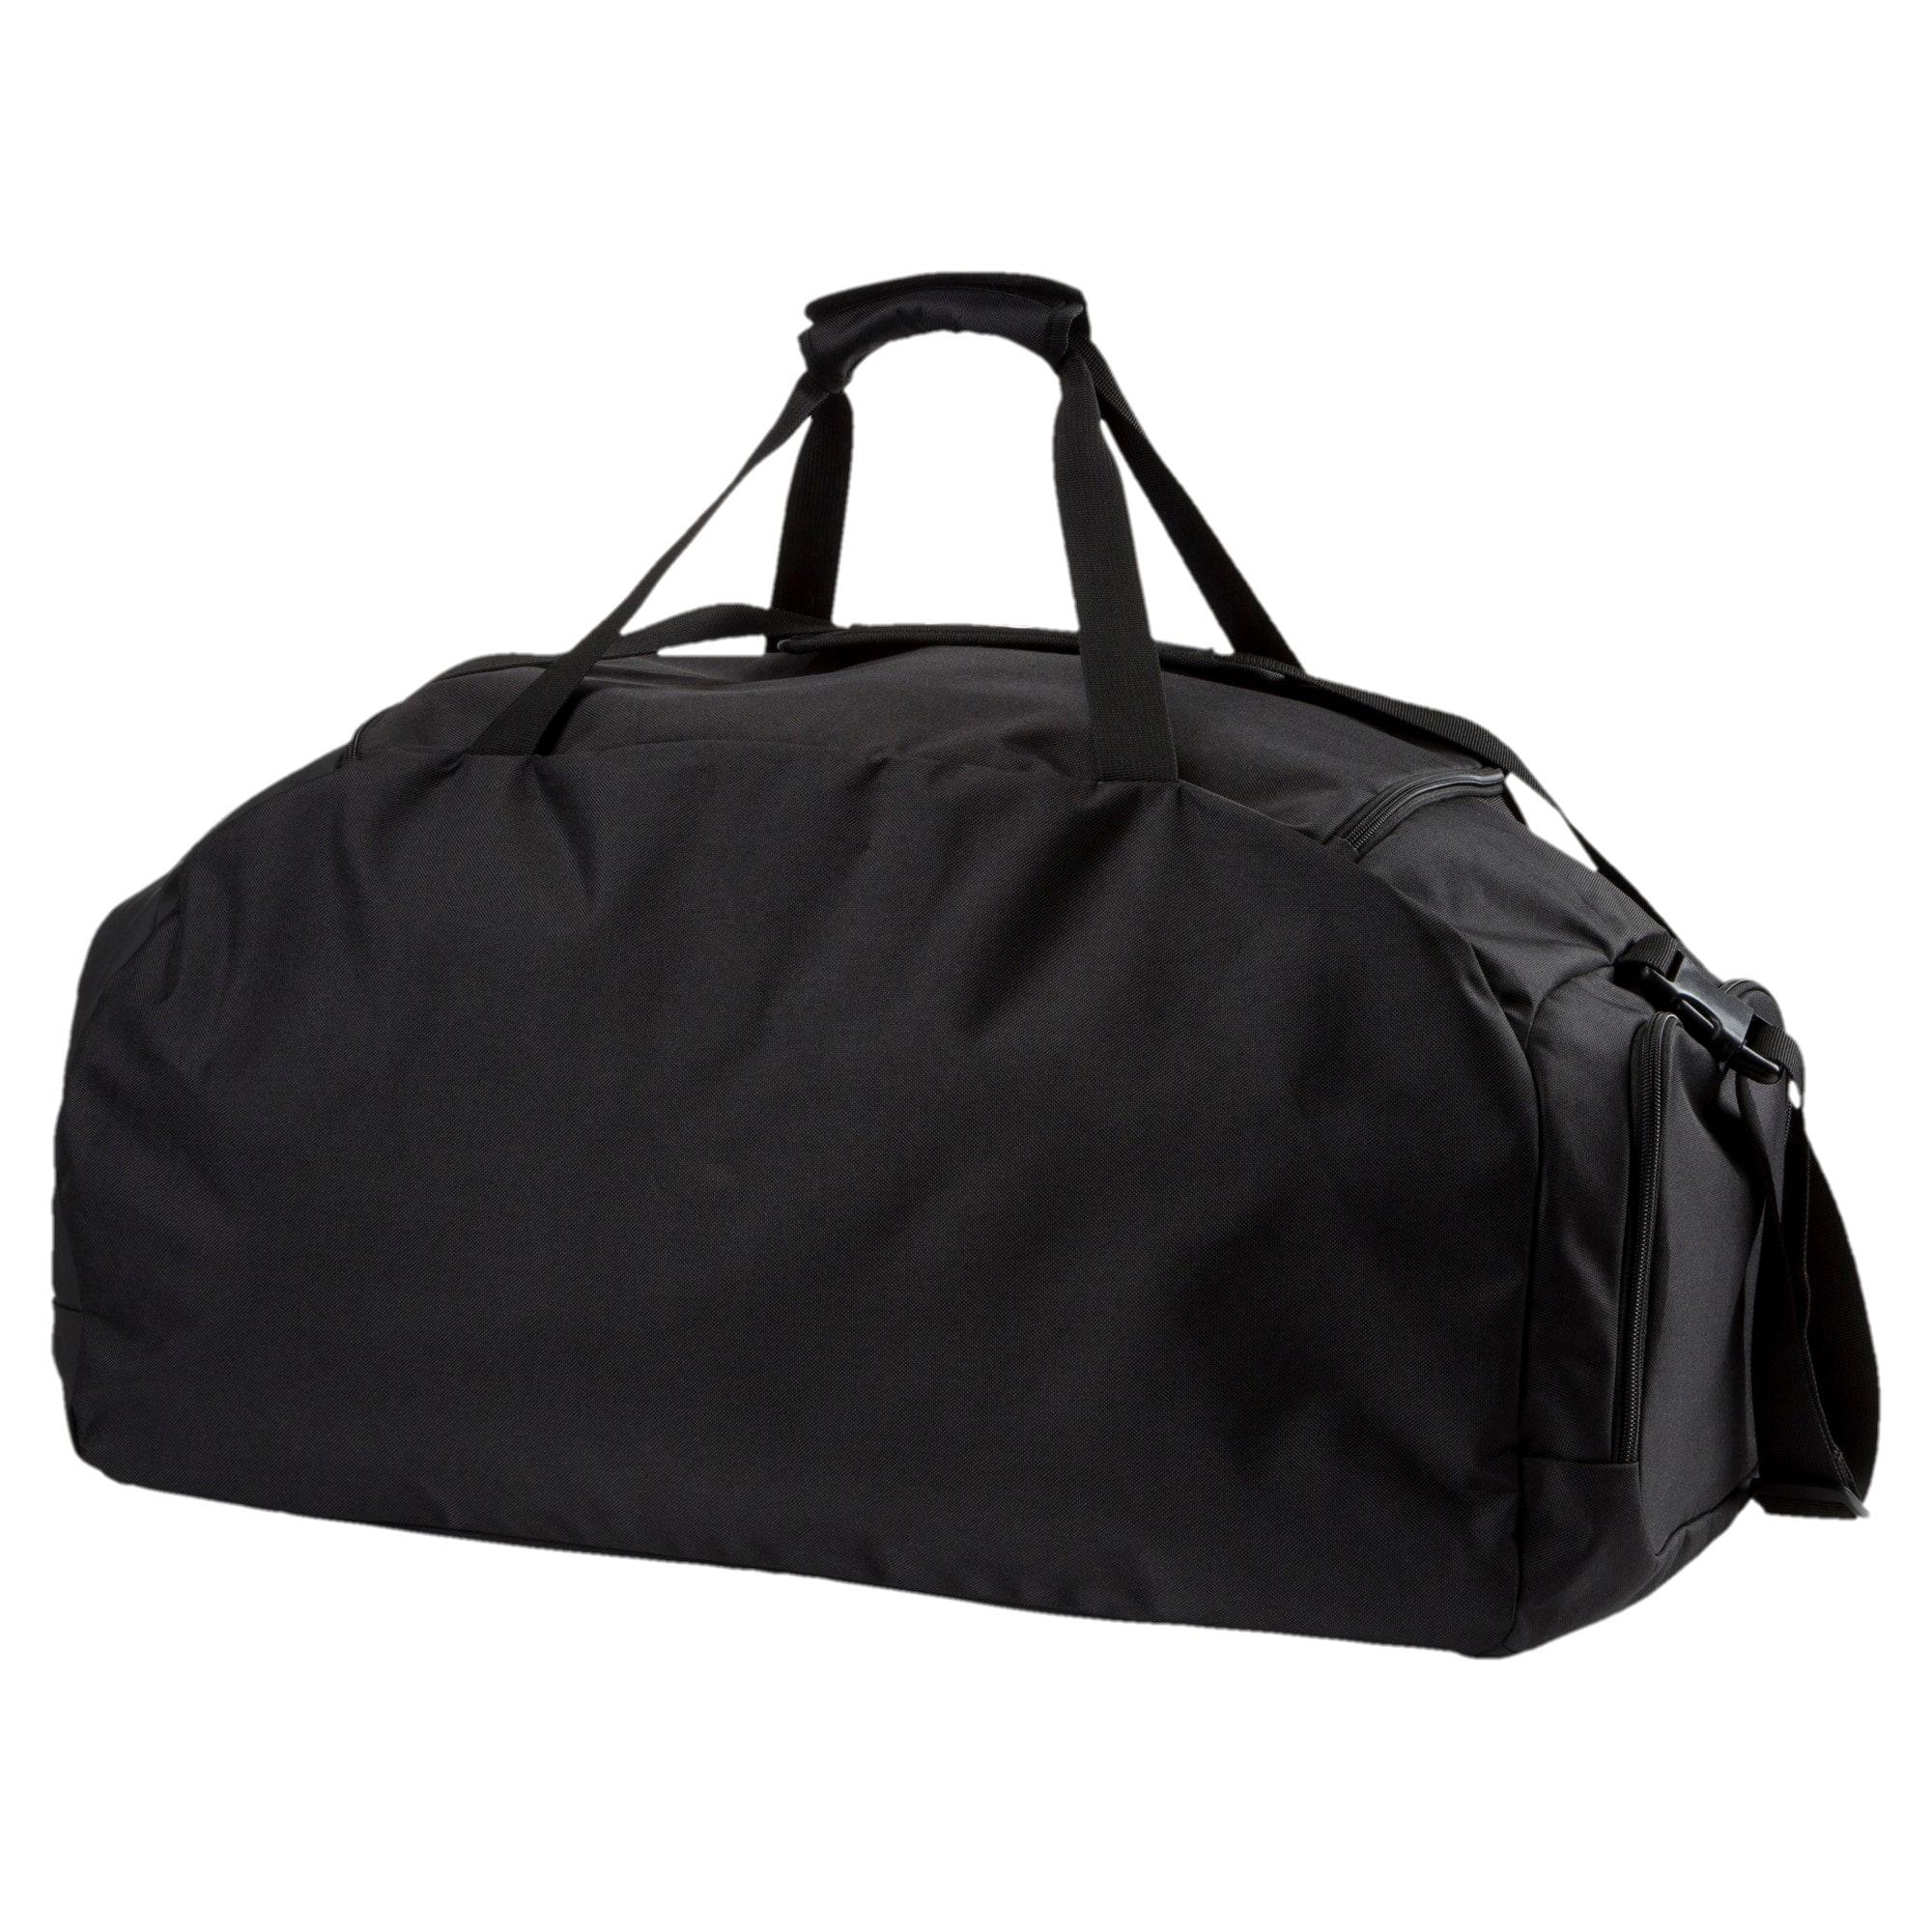 Thumbnail 2 of Liga Large Bag, Puma Black, medium